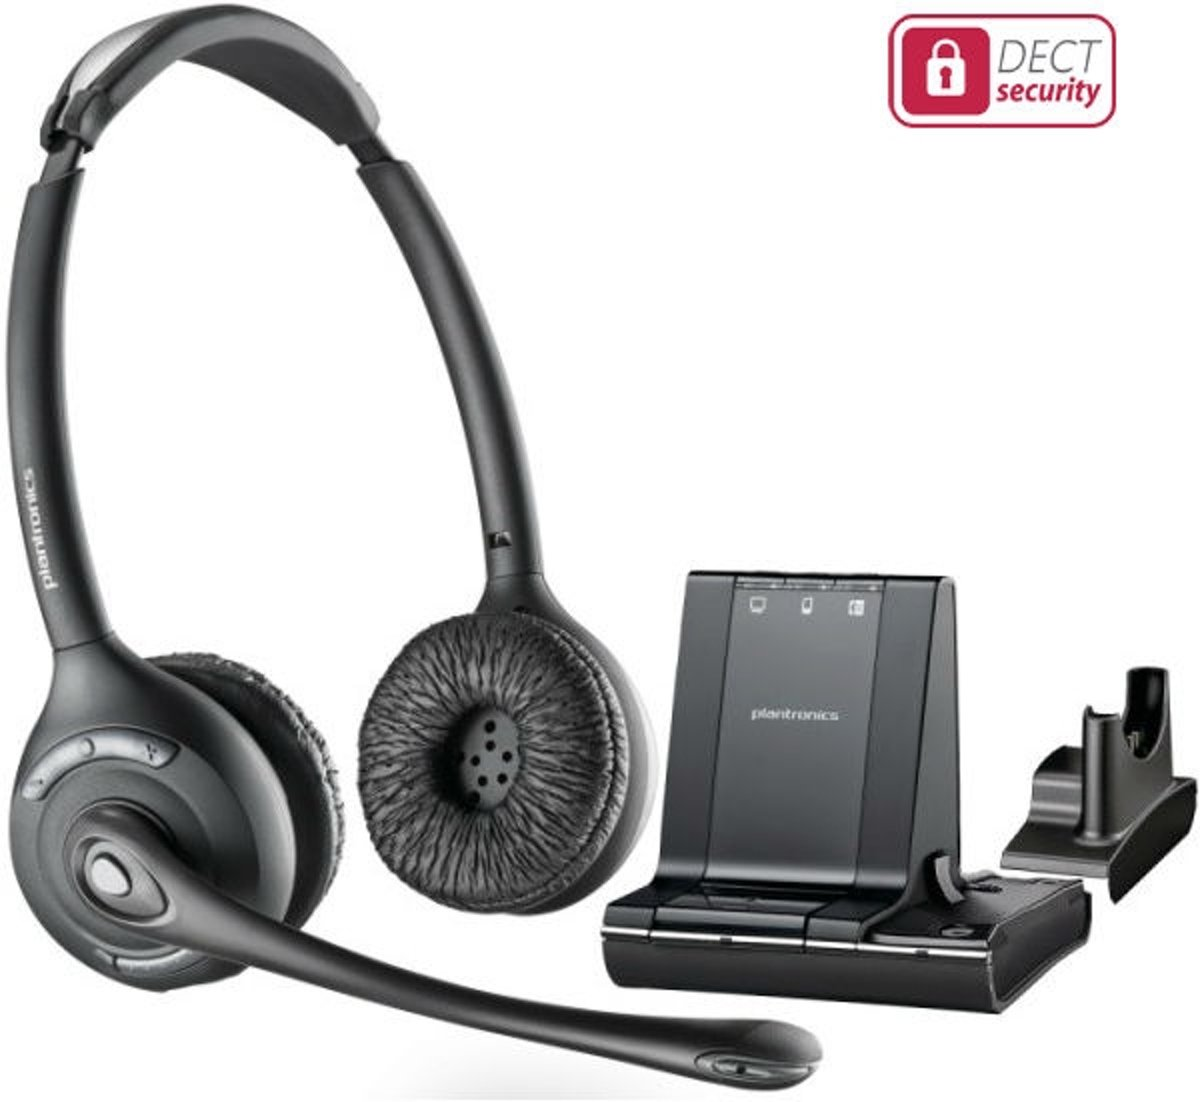 Plantronics Savi W720 Telefoonheadset DECT Draadloos, Stereo On Ear Zwart